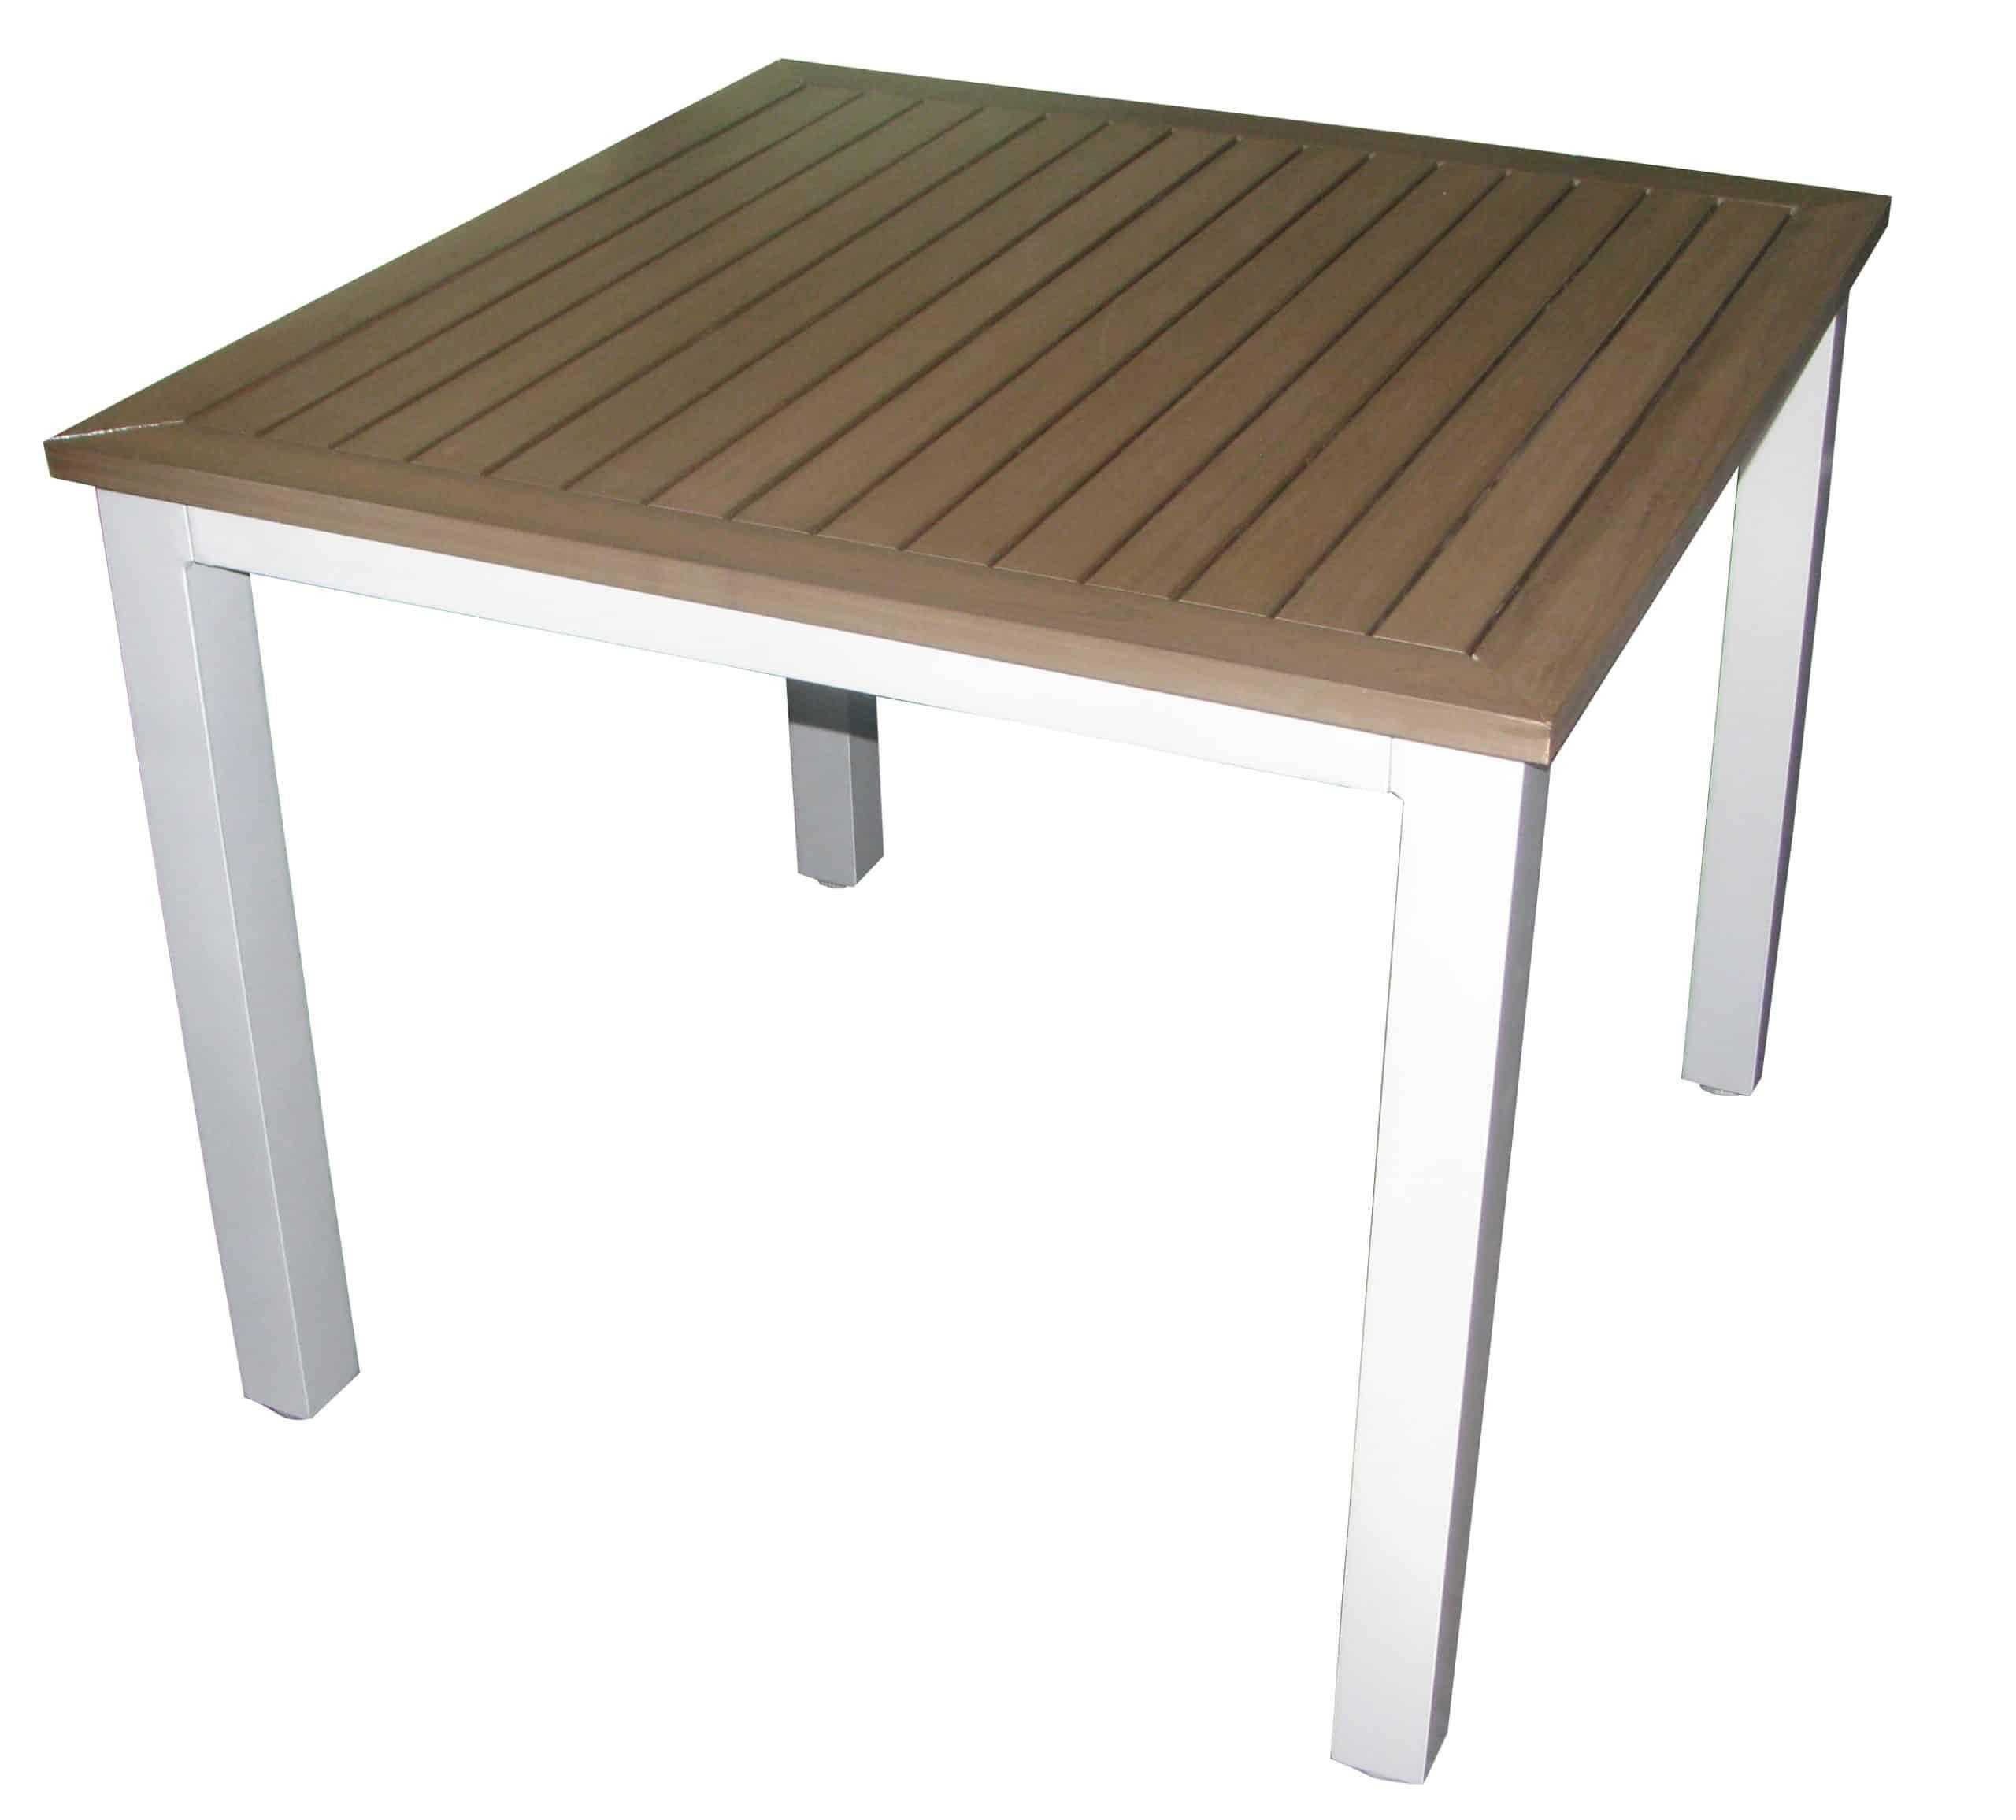 U0027FAUX WOOD ALUMINIUM DINING TABLESu0027   Daydream Leisure Furniture Part 28